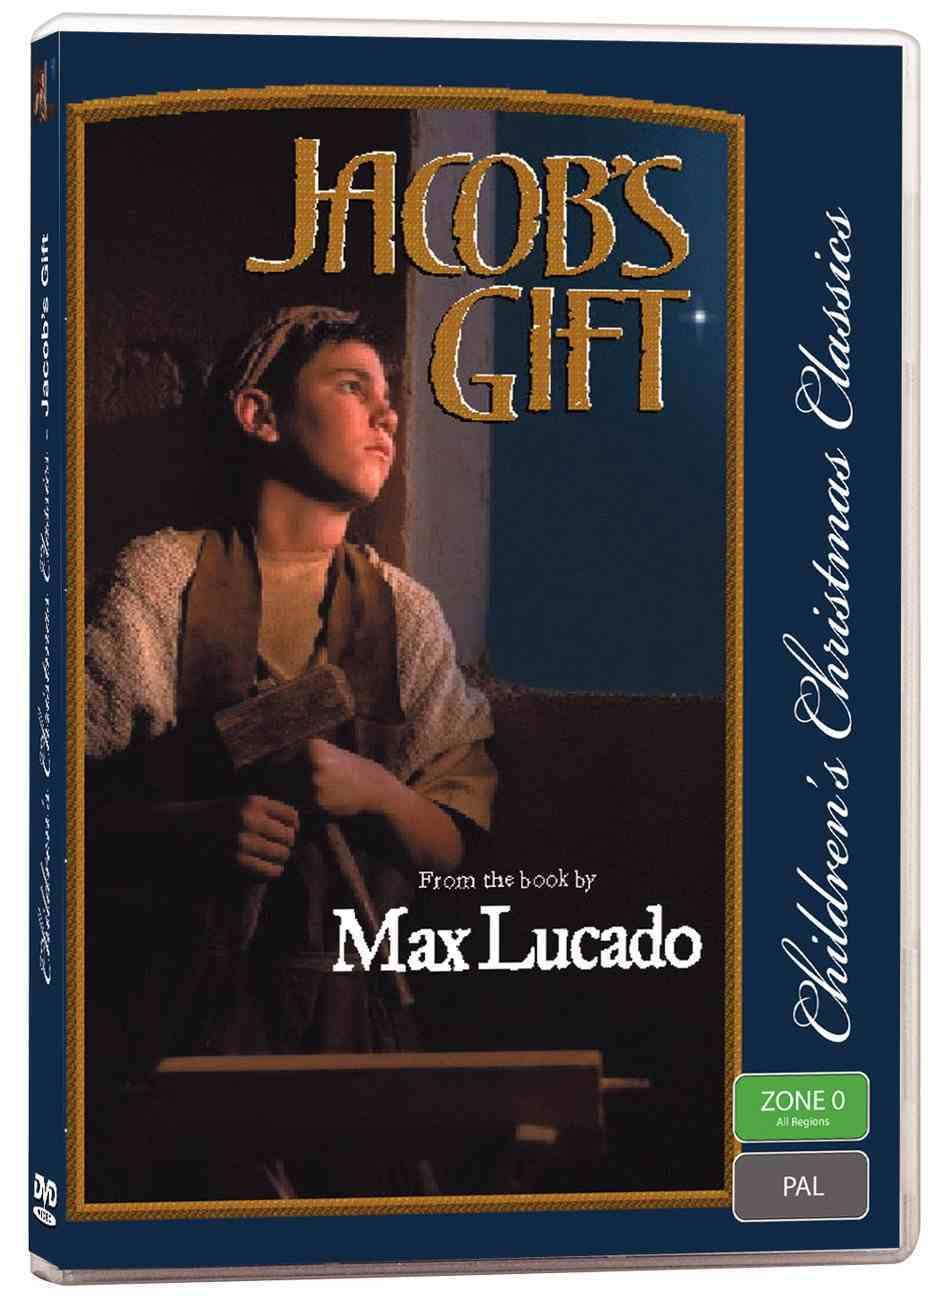 Jacob's Gift DVD